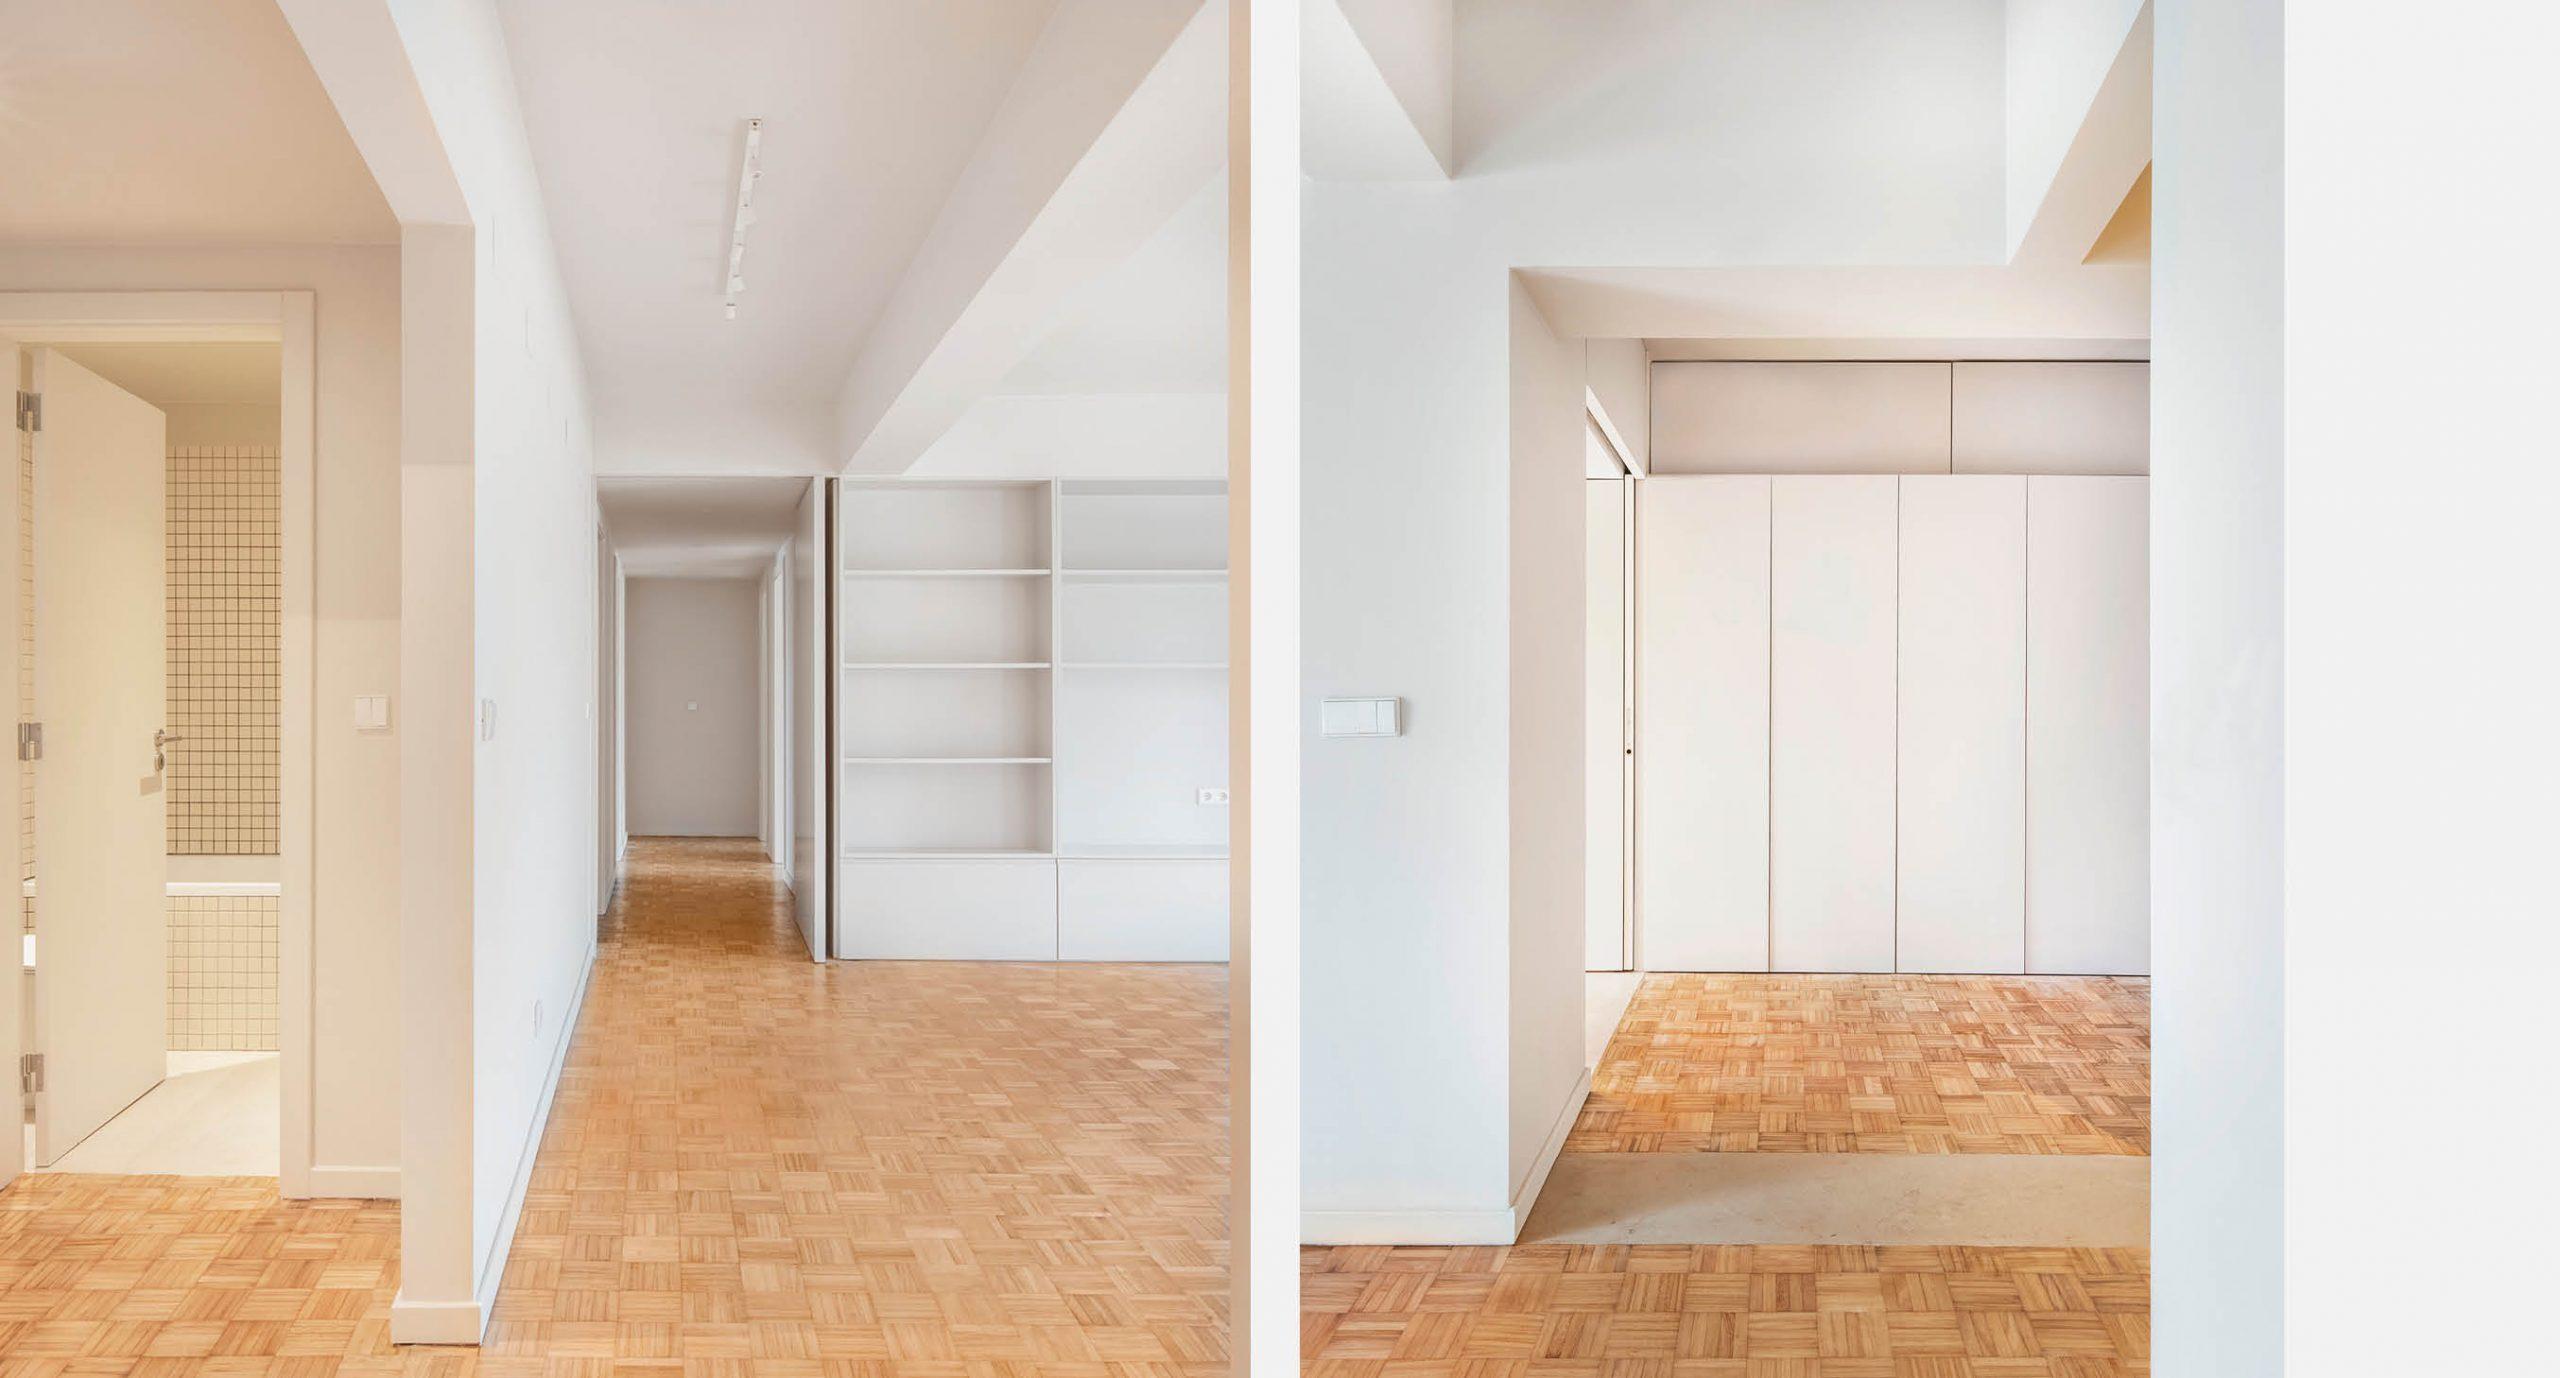 Spacegram_FredericoGeorge_Apartment_Refurbishment_White_Integrated_Furniture03